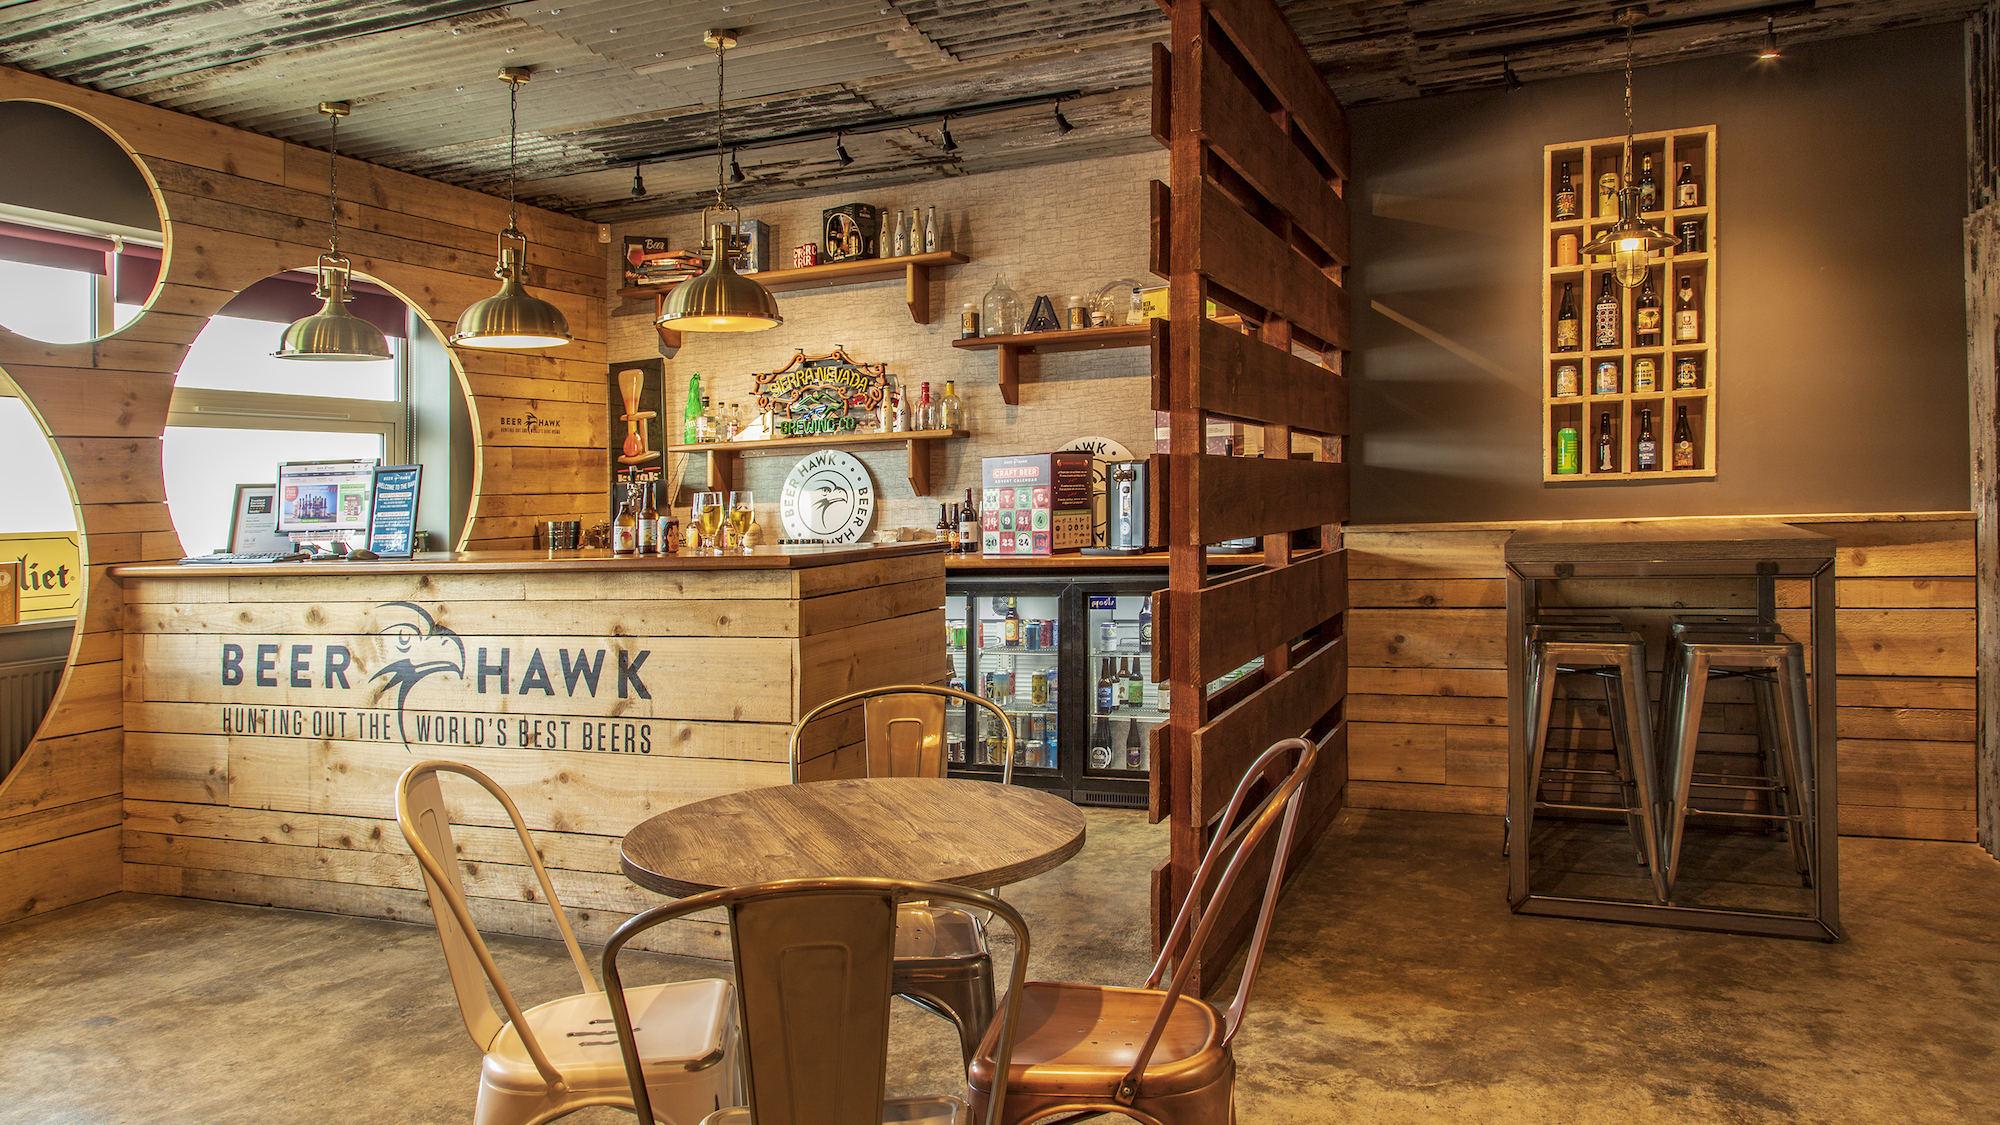 Beer Hawk